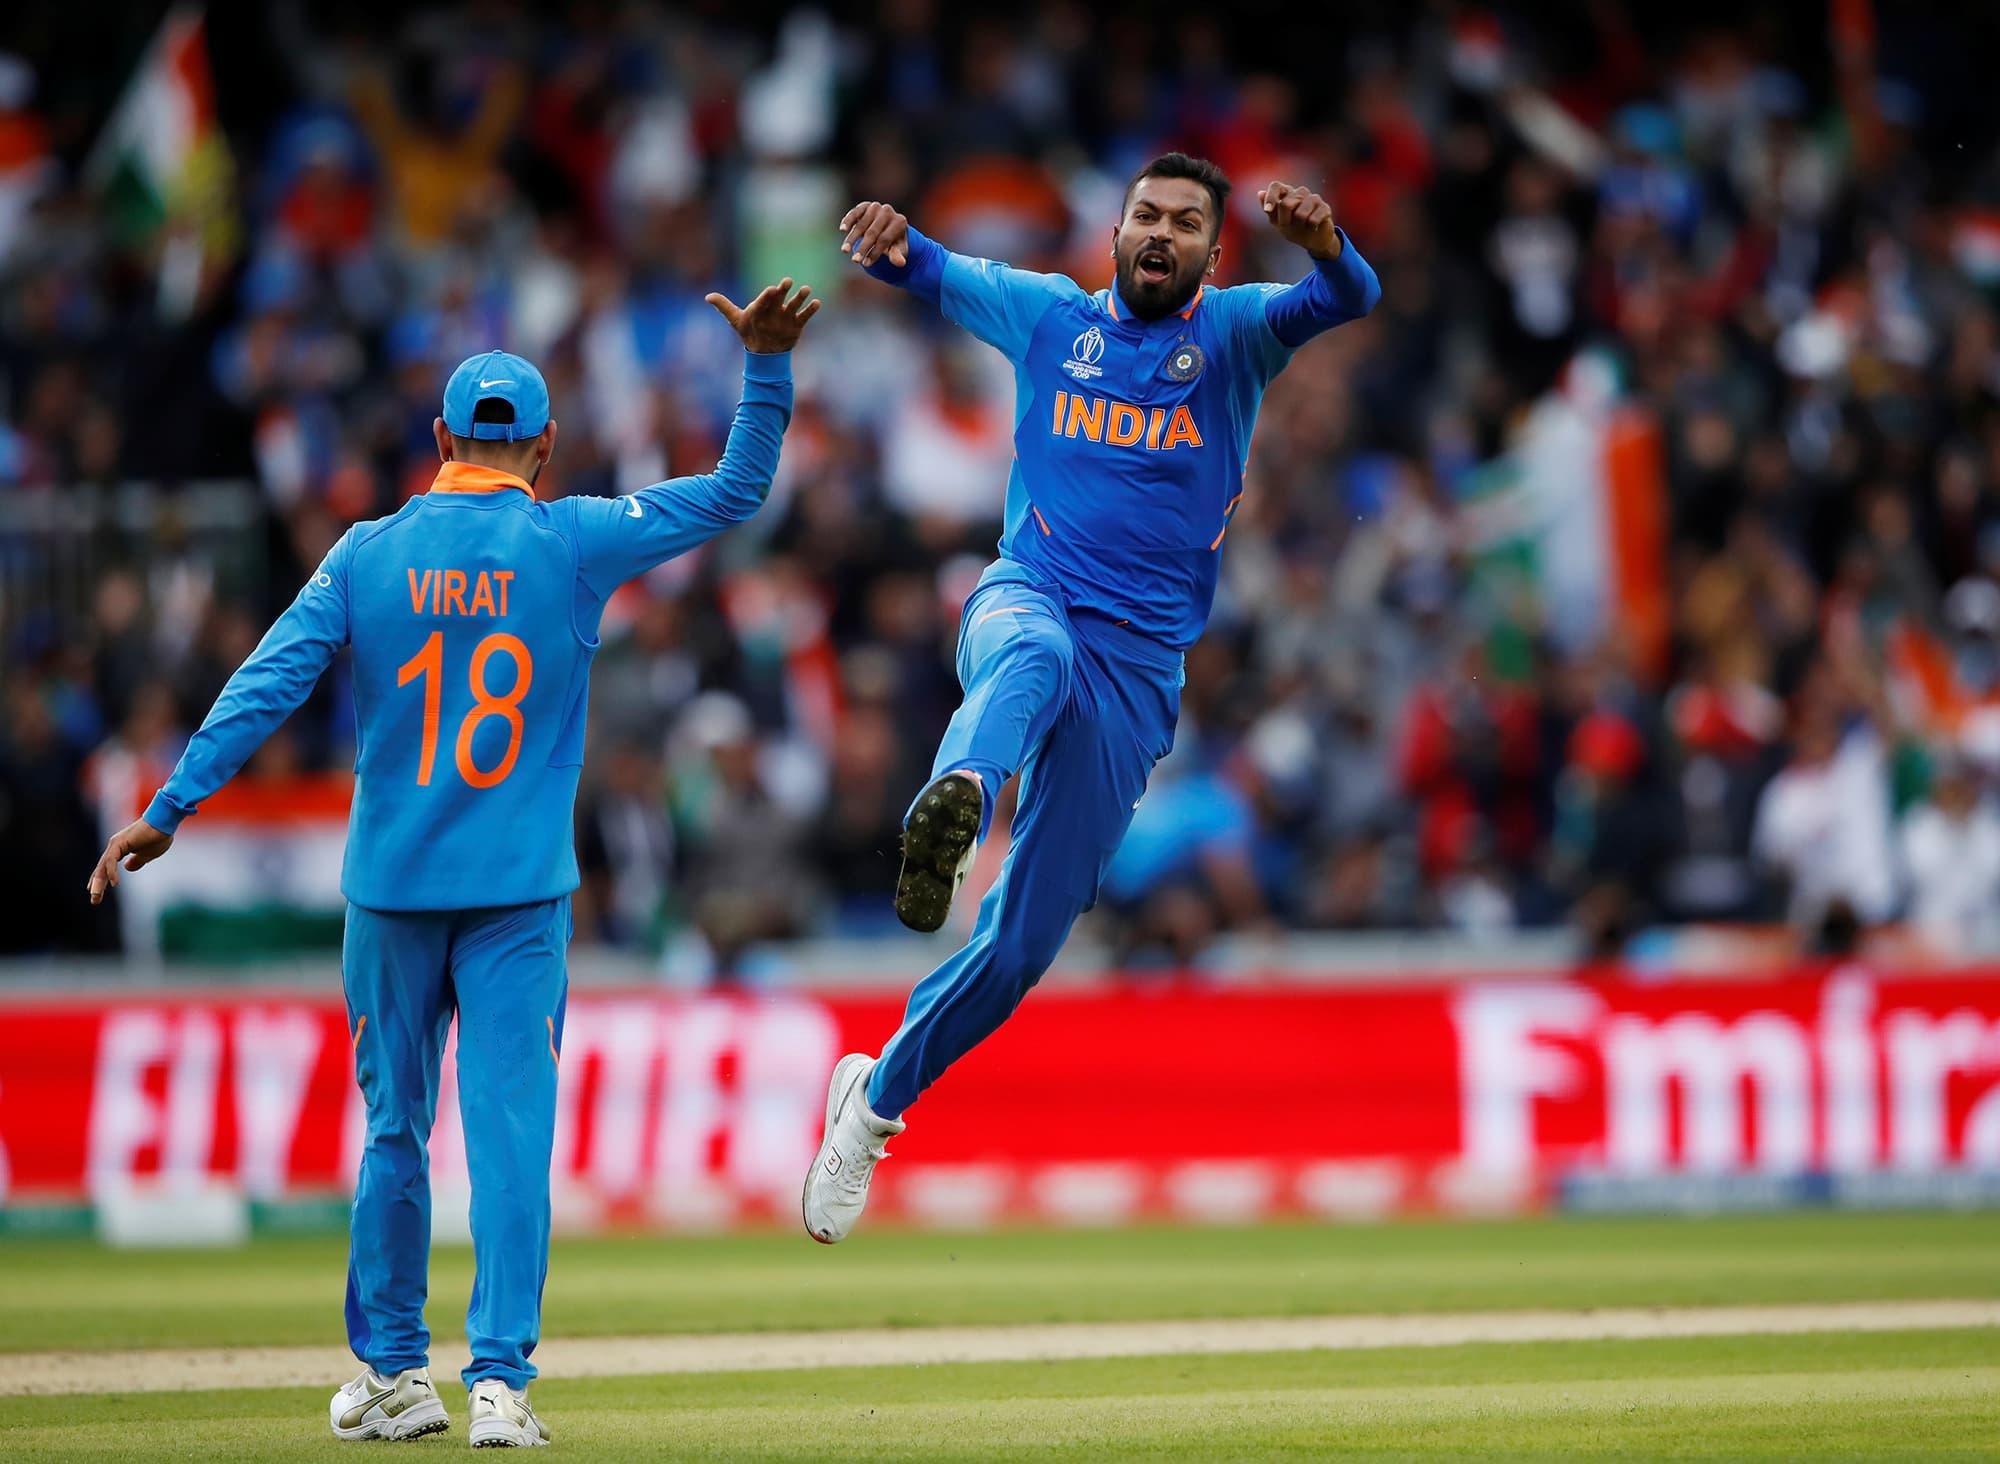 Hardik Pandya celebrates taking the wicket of Shoaib Malik. ─ Reuters